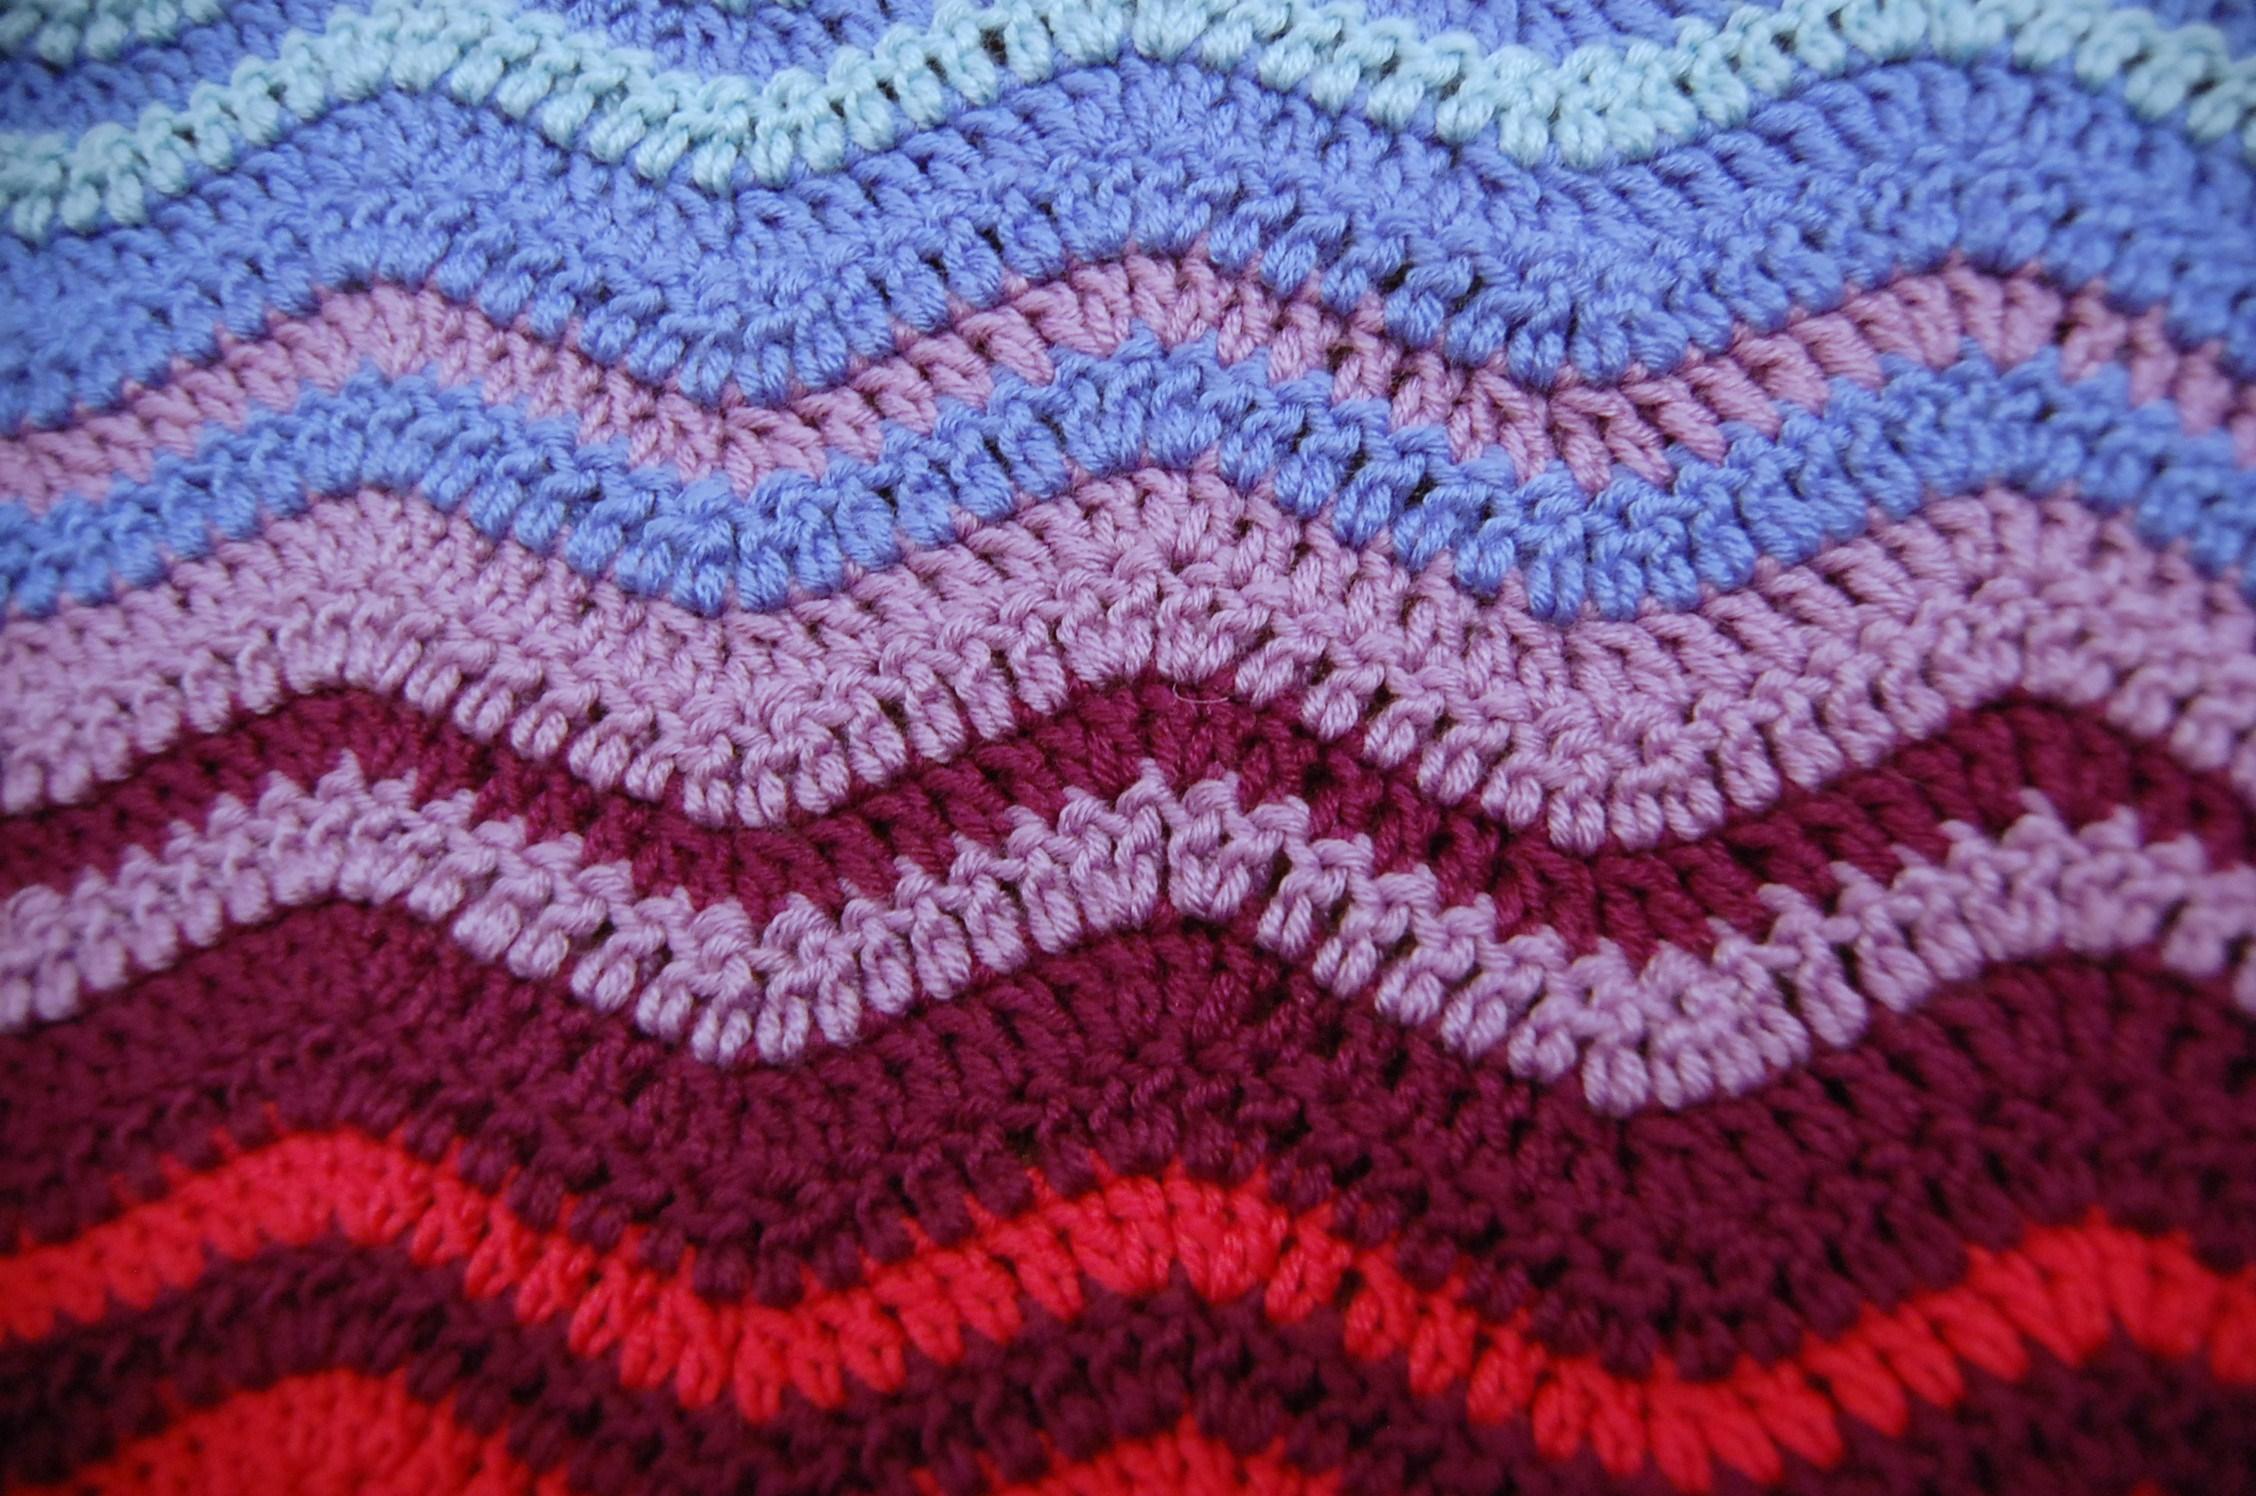 Crochet ripple blanket pattern crochet ripple blanket pattern bankloansurffo Images